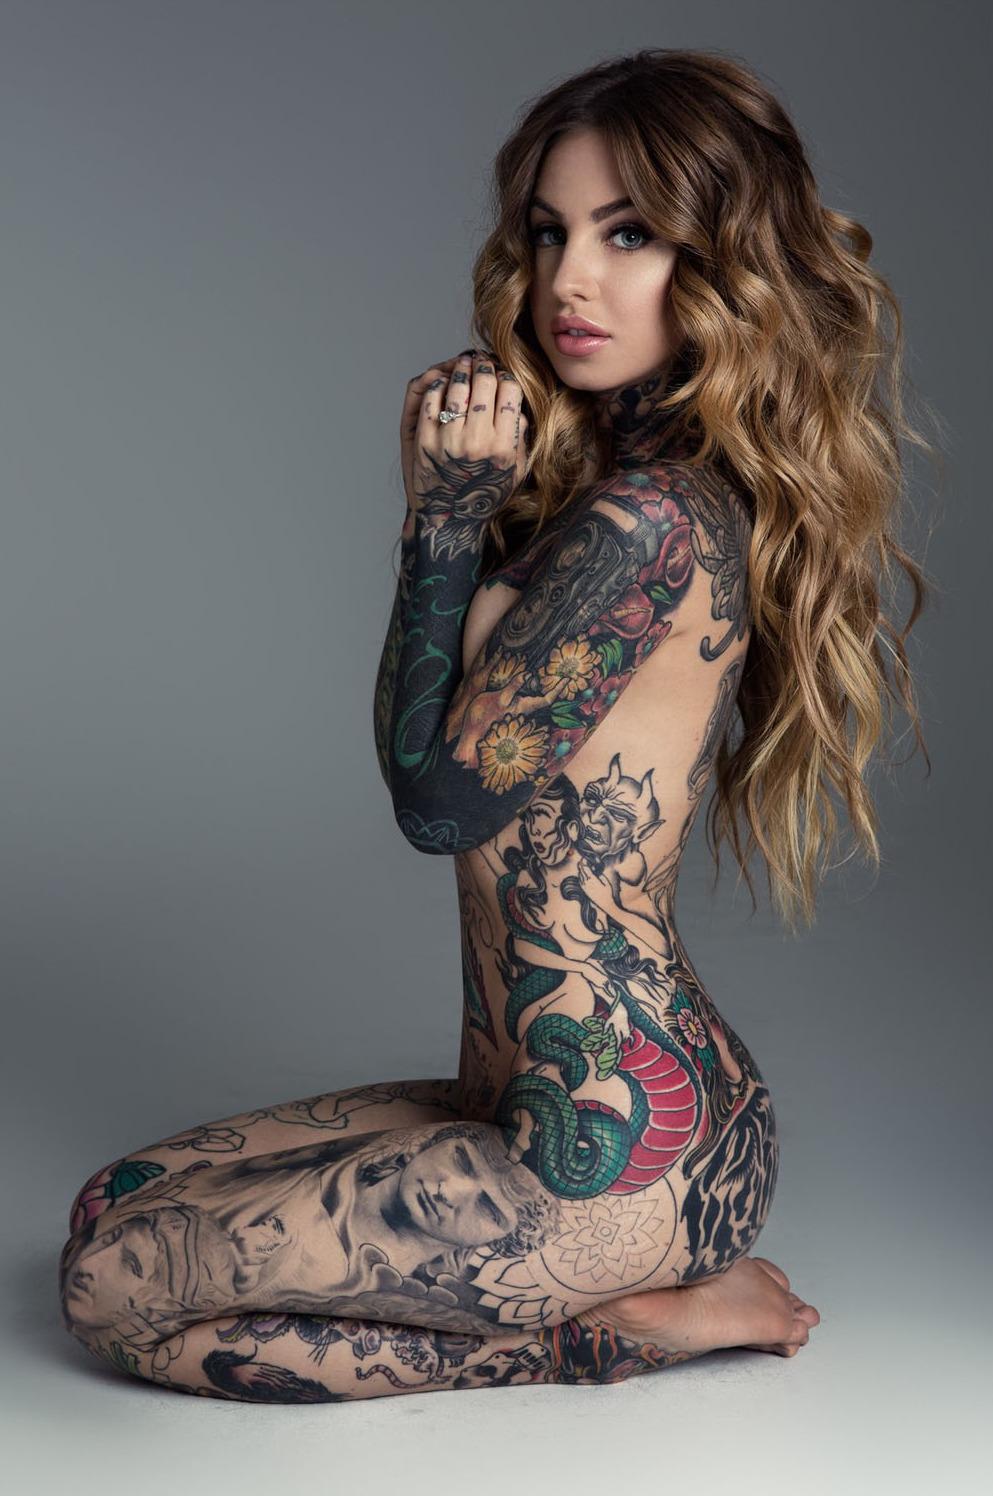 tattoo_girl.jpg